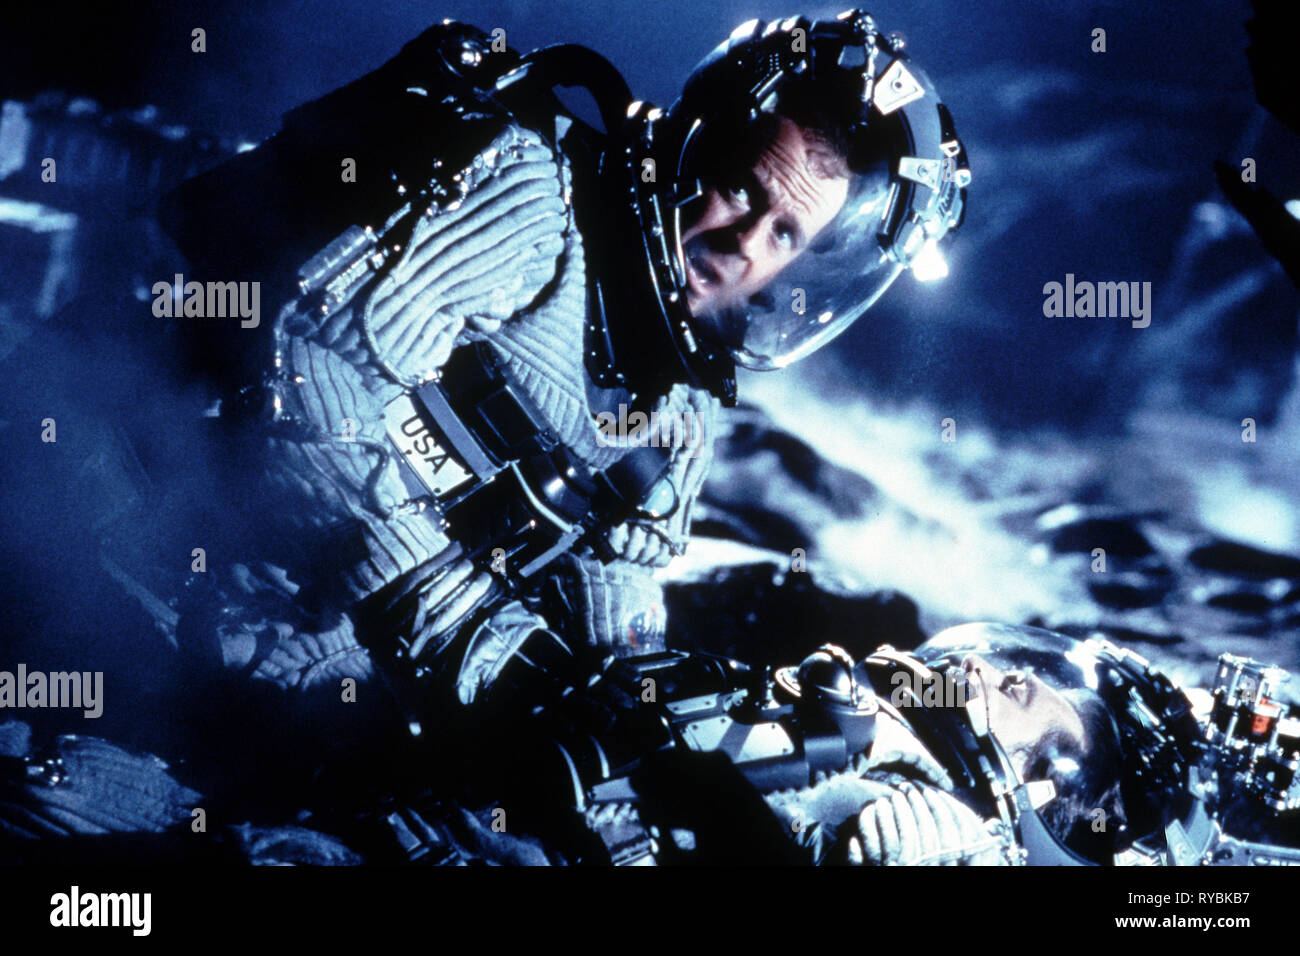 BRUCE WILLIS, ARMAGEDDON, 1998 - Stock Image